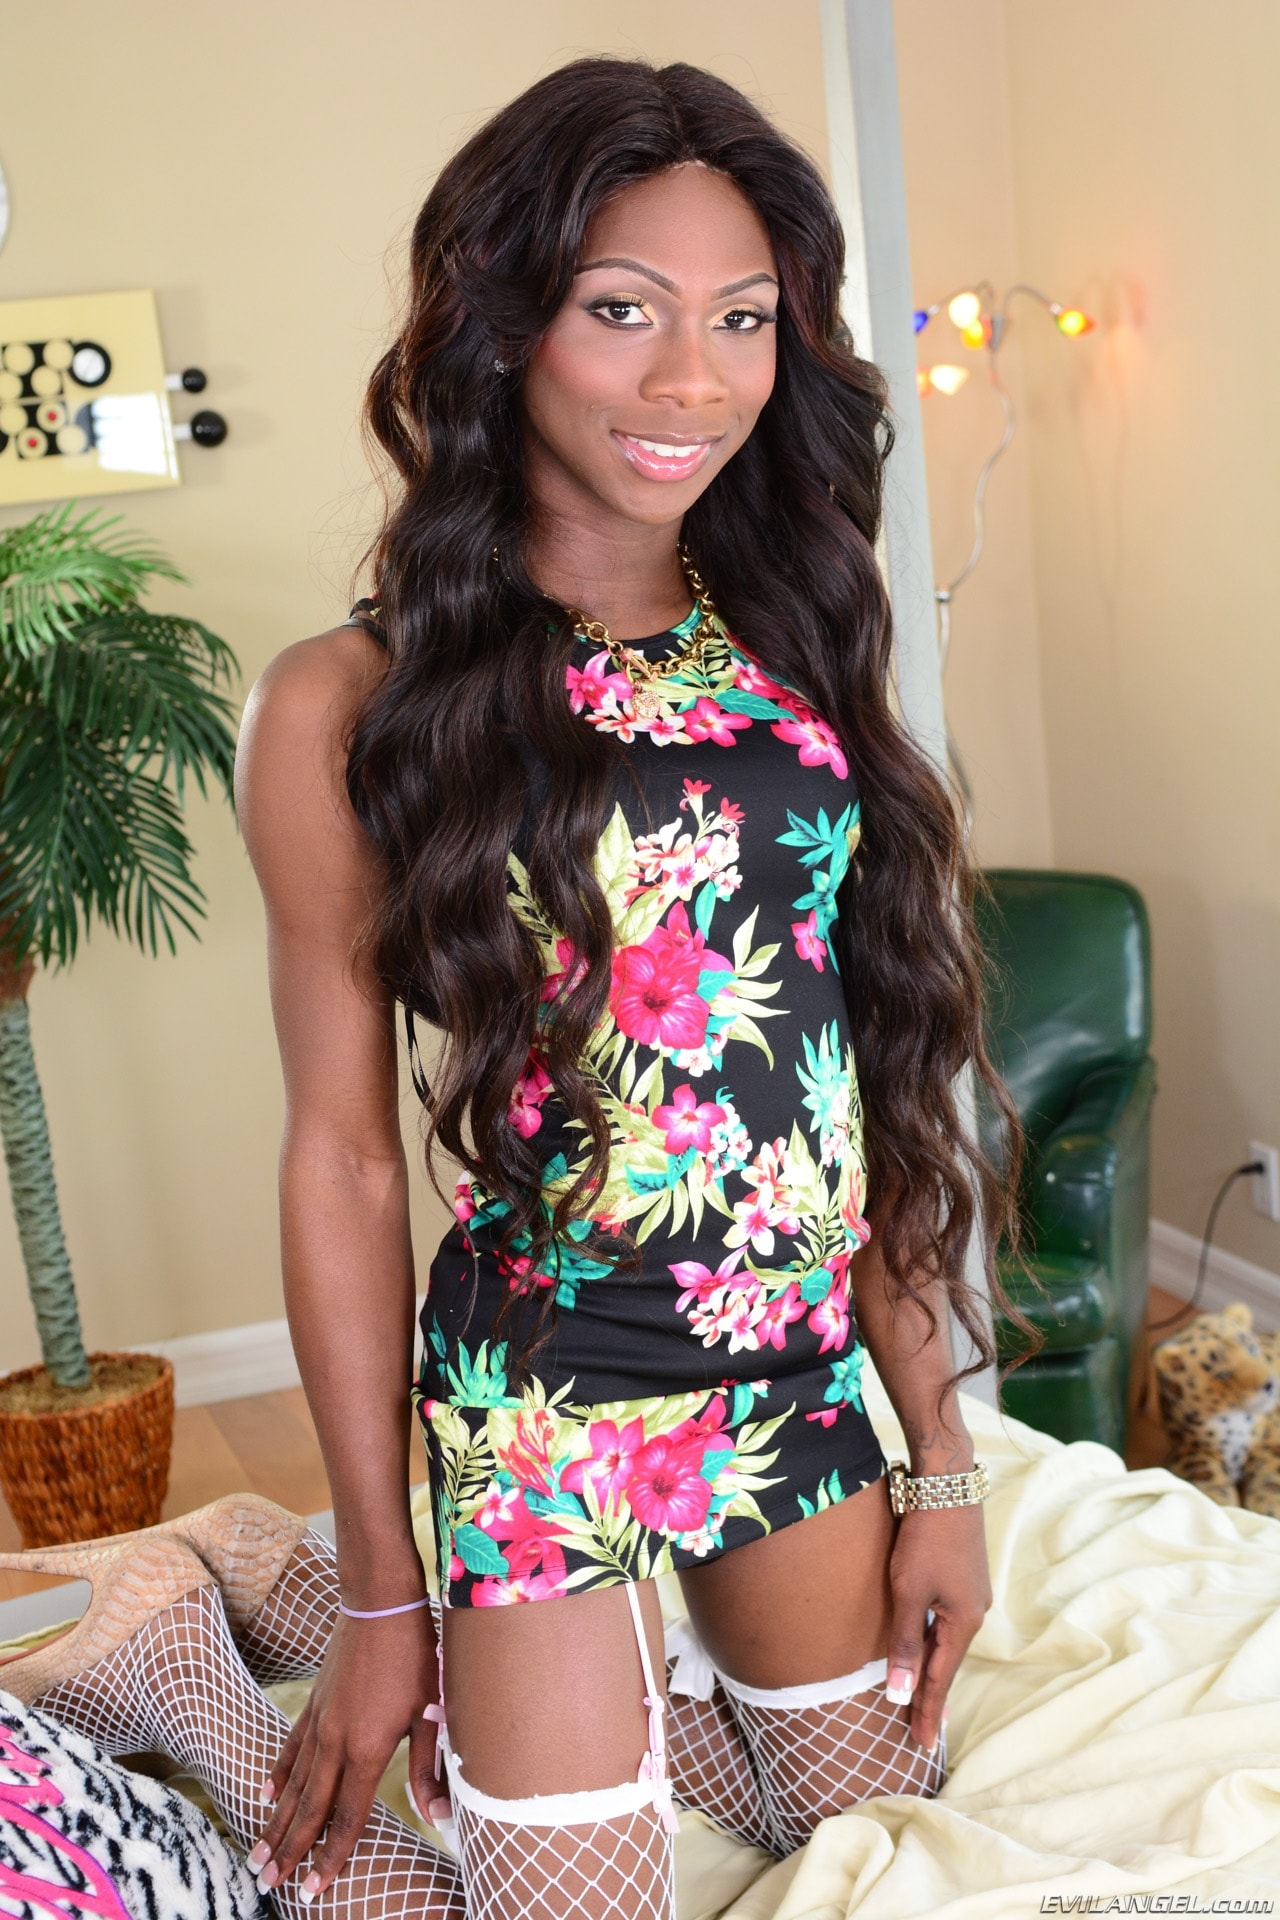 I Love Black Shemales 'The Next She-Male Idol 09' starring Kourtney Dash (Photo 1)